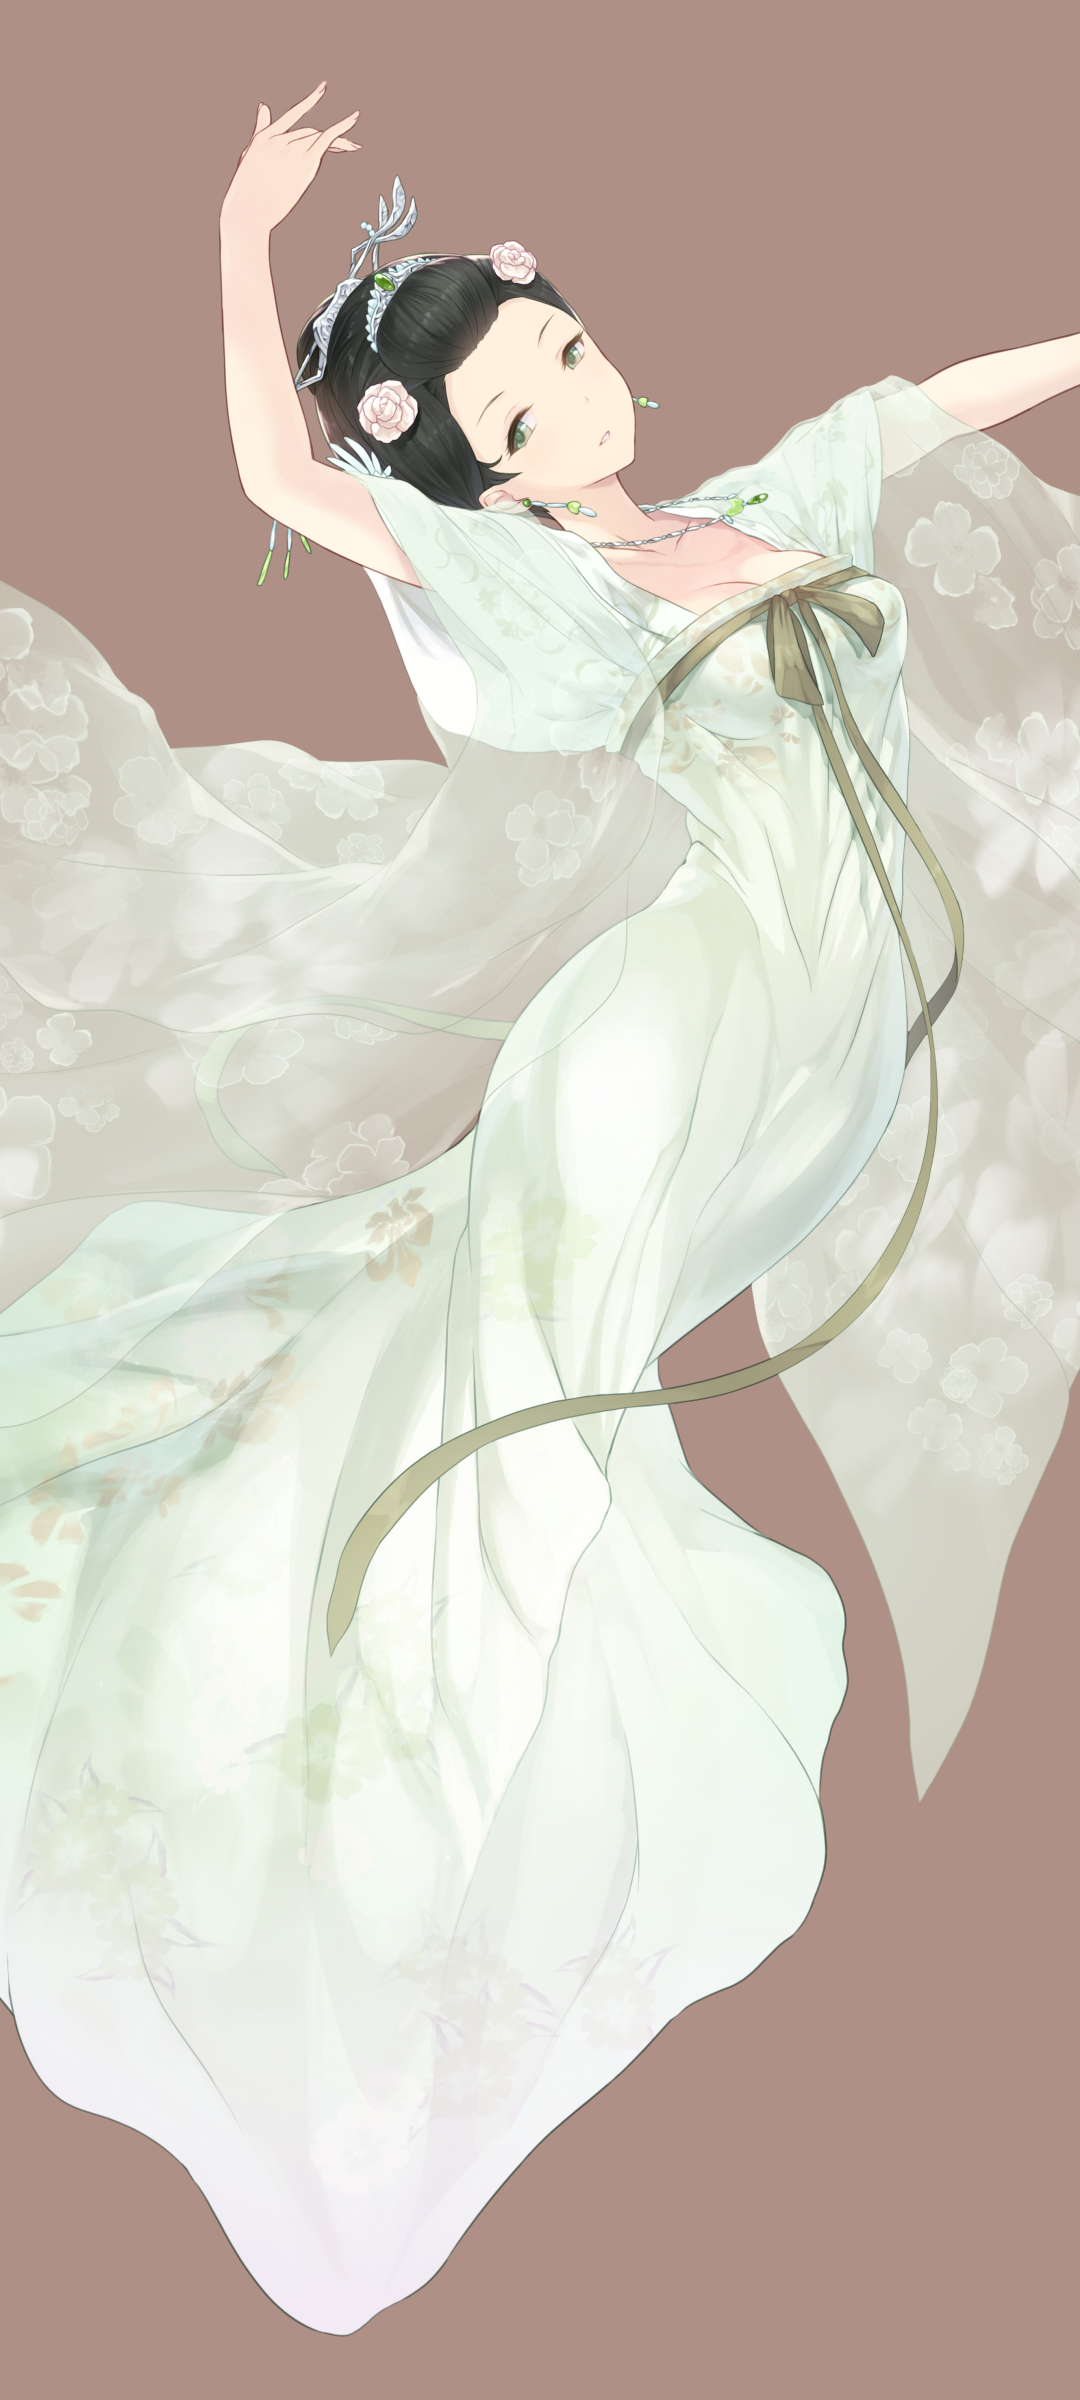 Wallpaper 901338